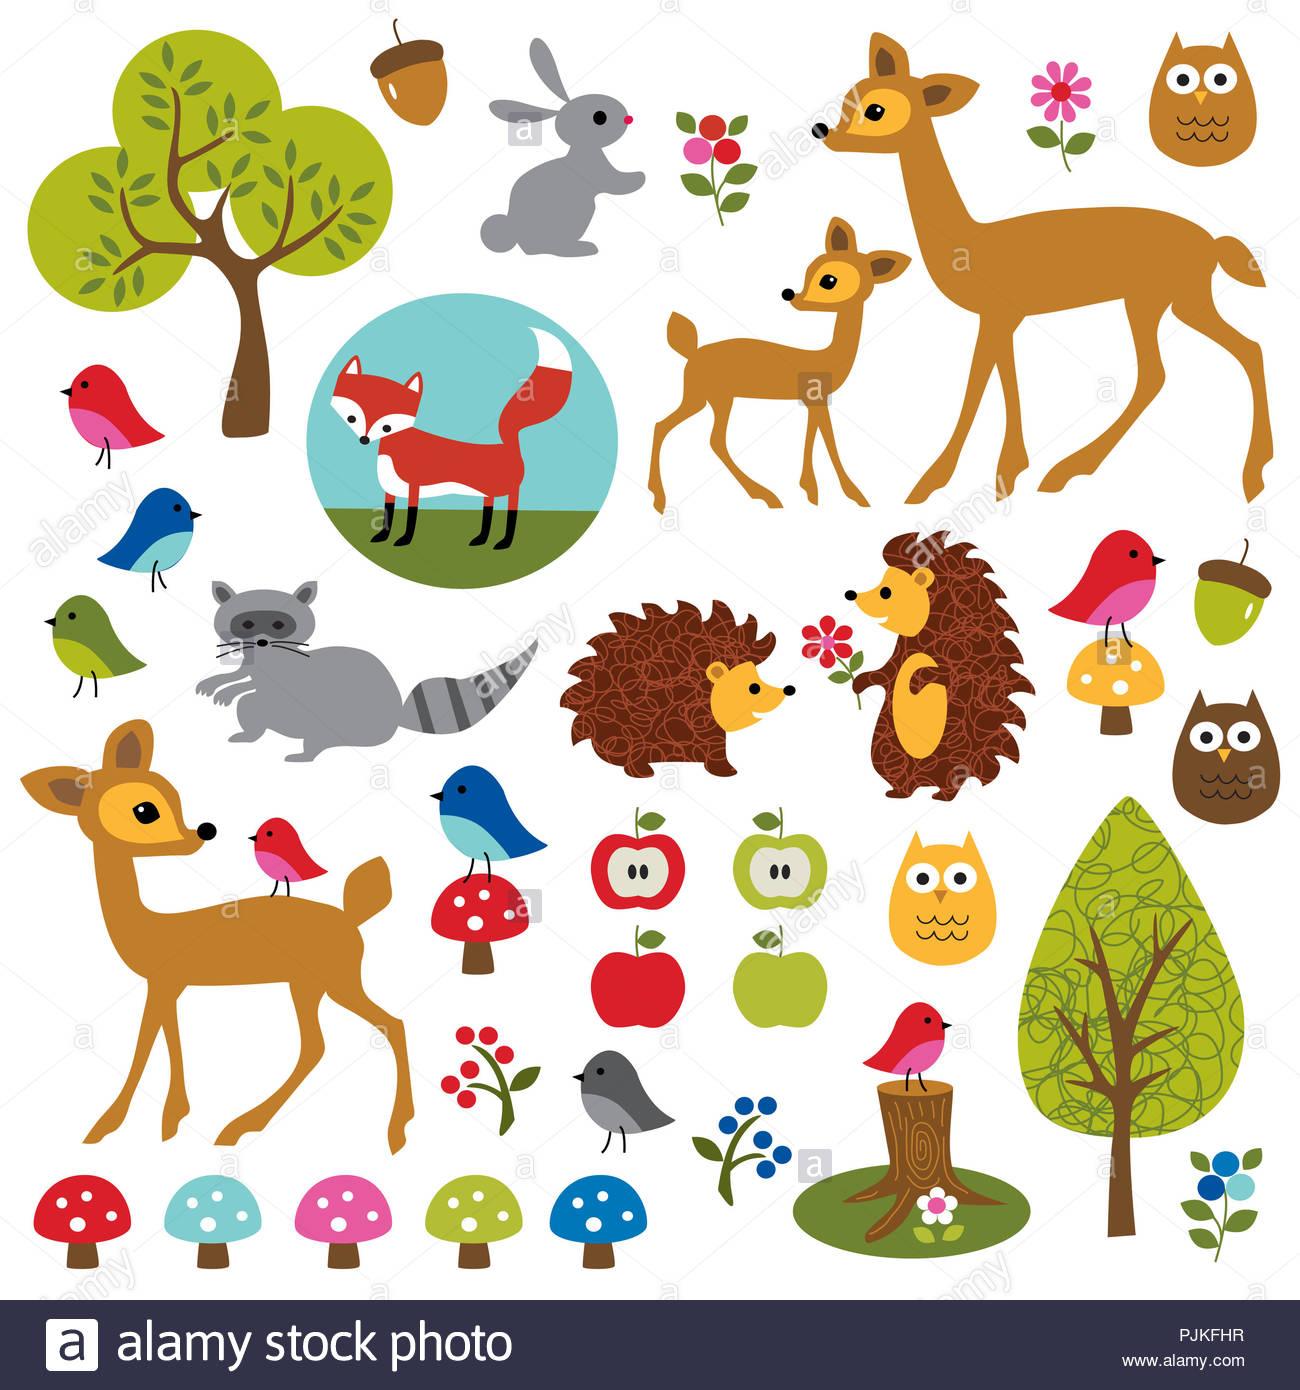 cute woodland animal vector illustrations - Stock Image